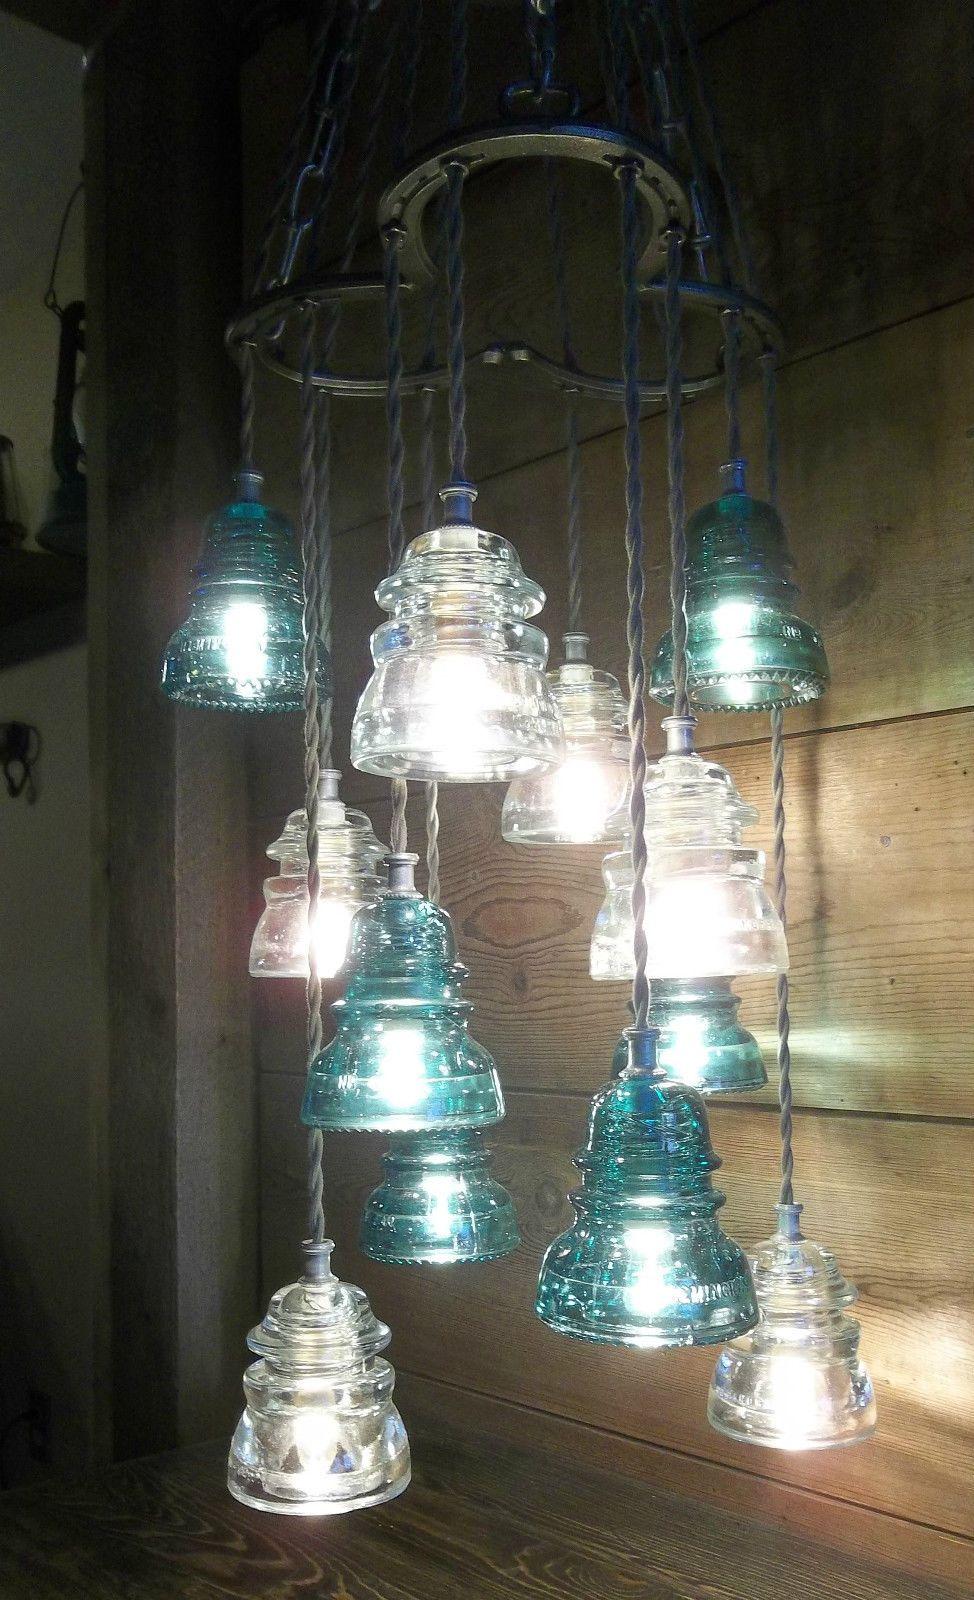 Horse shoe antique glass insulator pendant chandelier for Telephone insulator light fixture